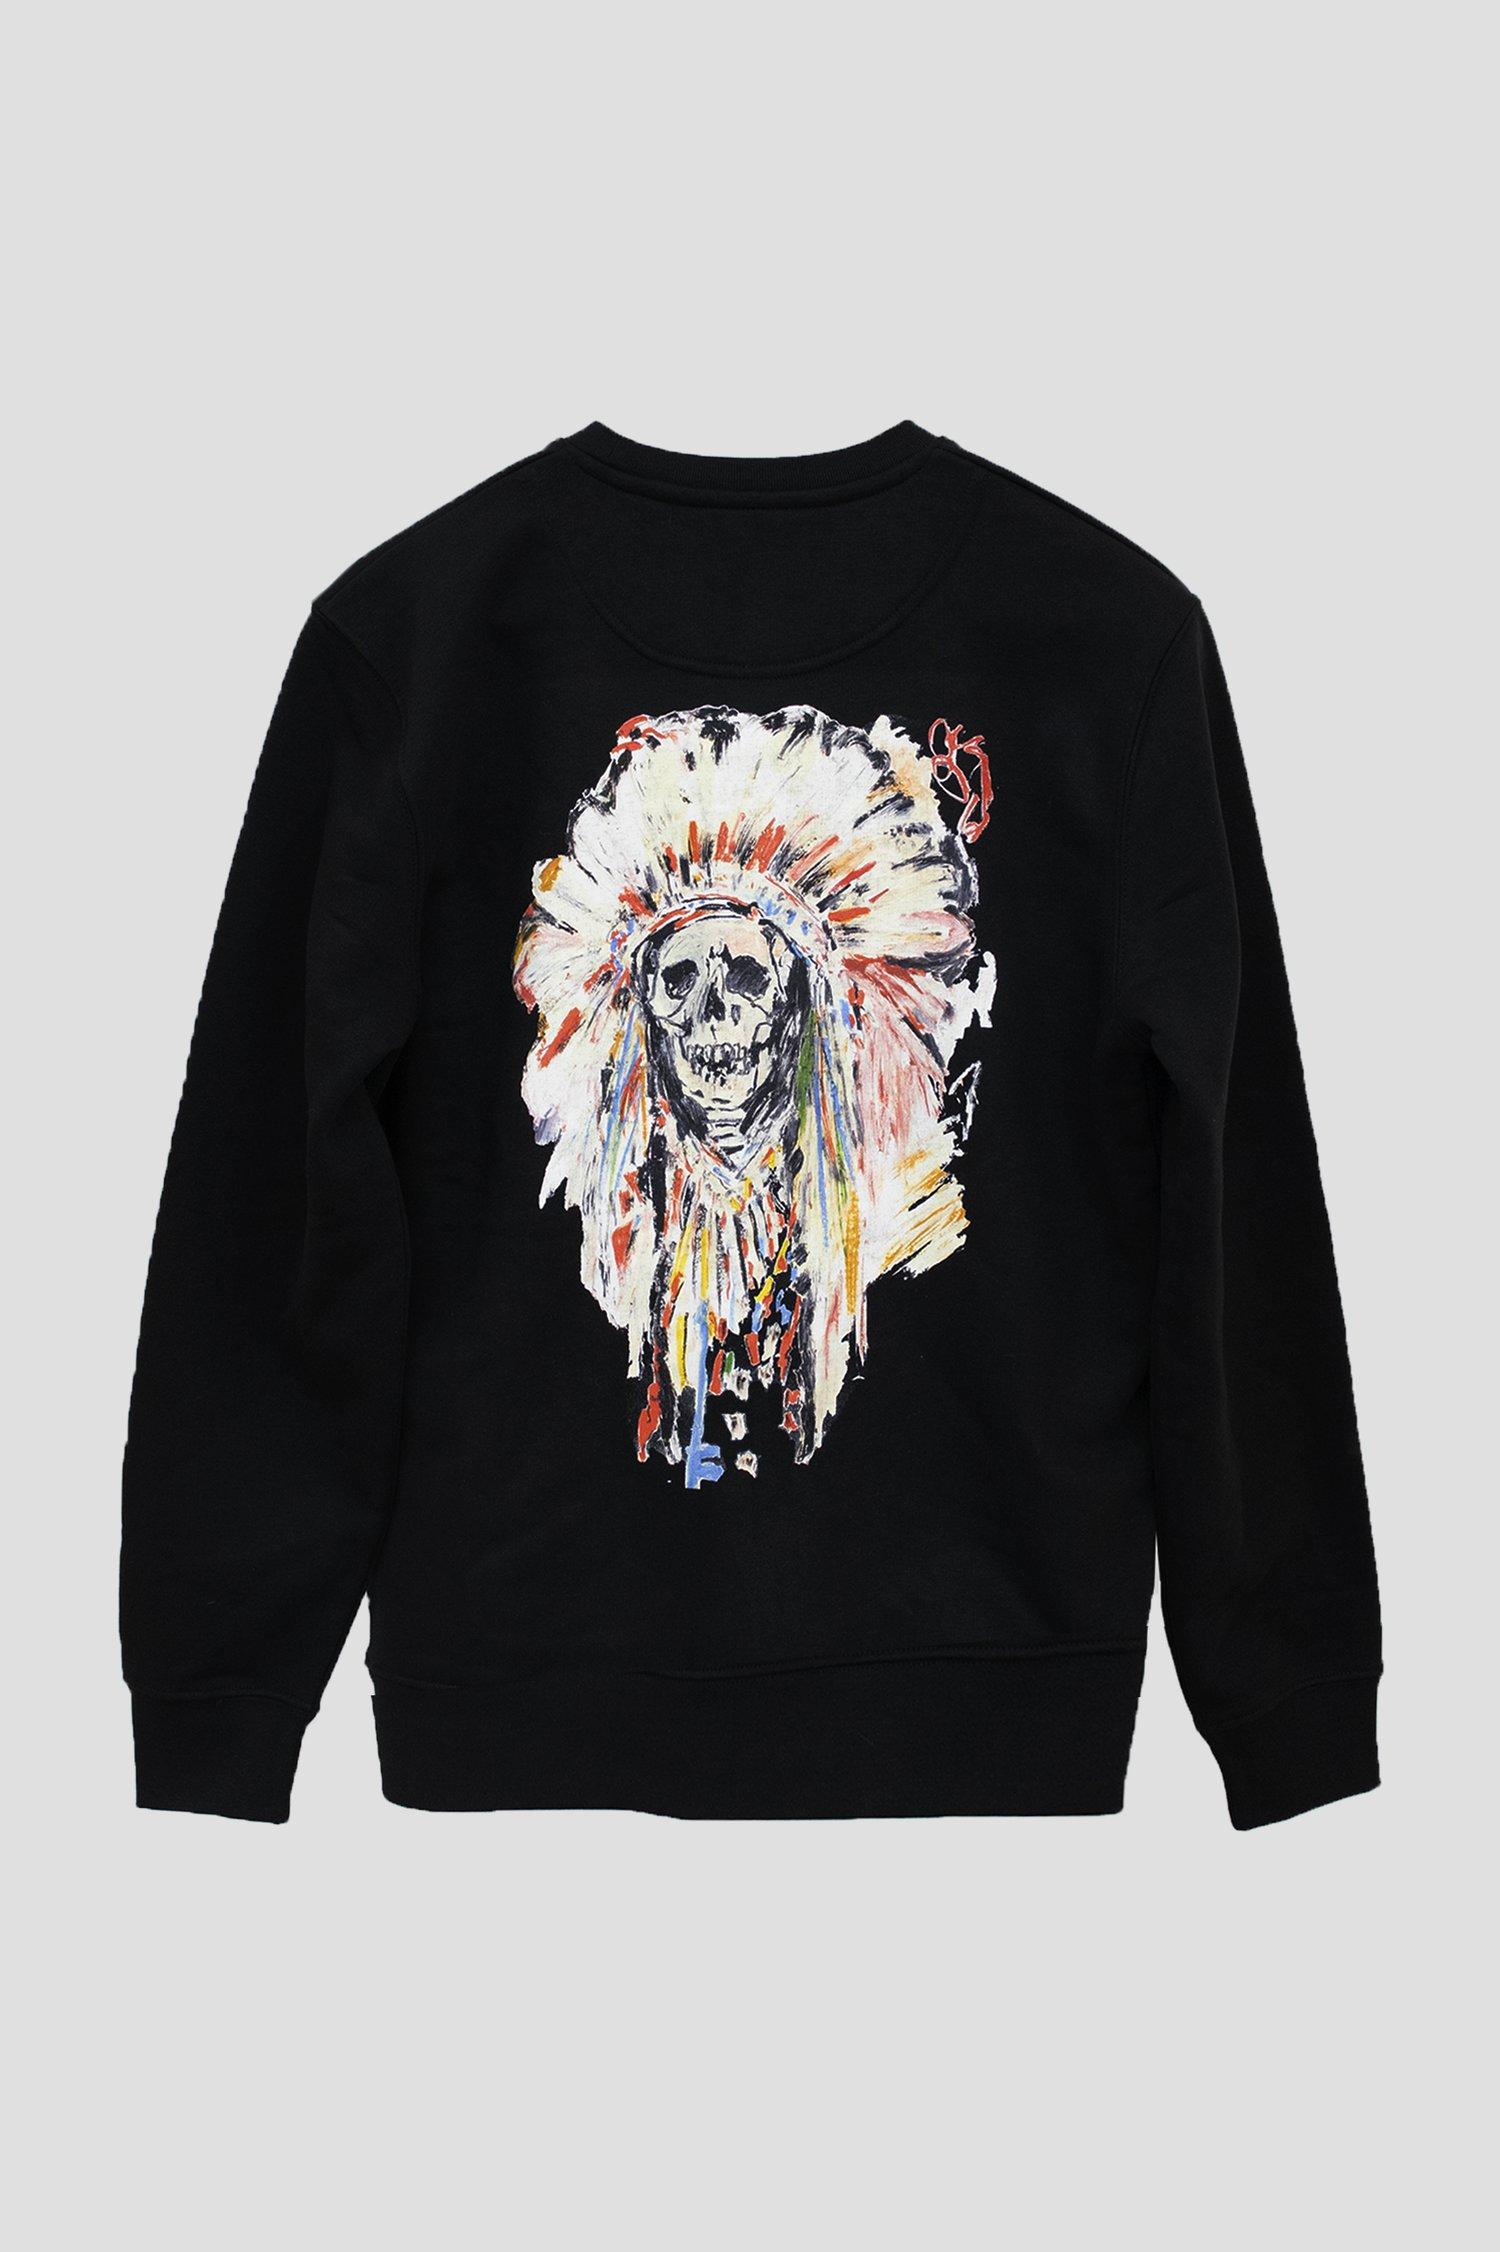 Image of Wes Lang - Sweatshirt / 195 € - 20 % = 156 €